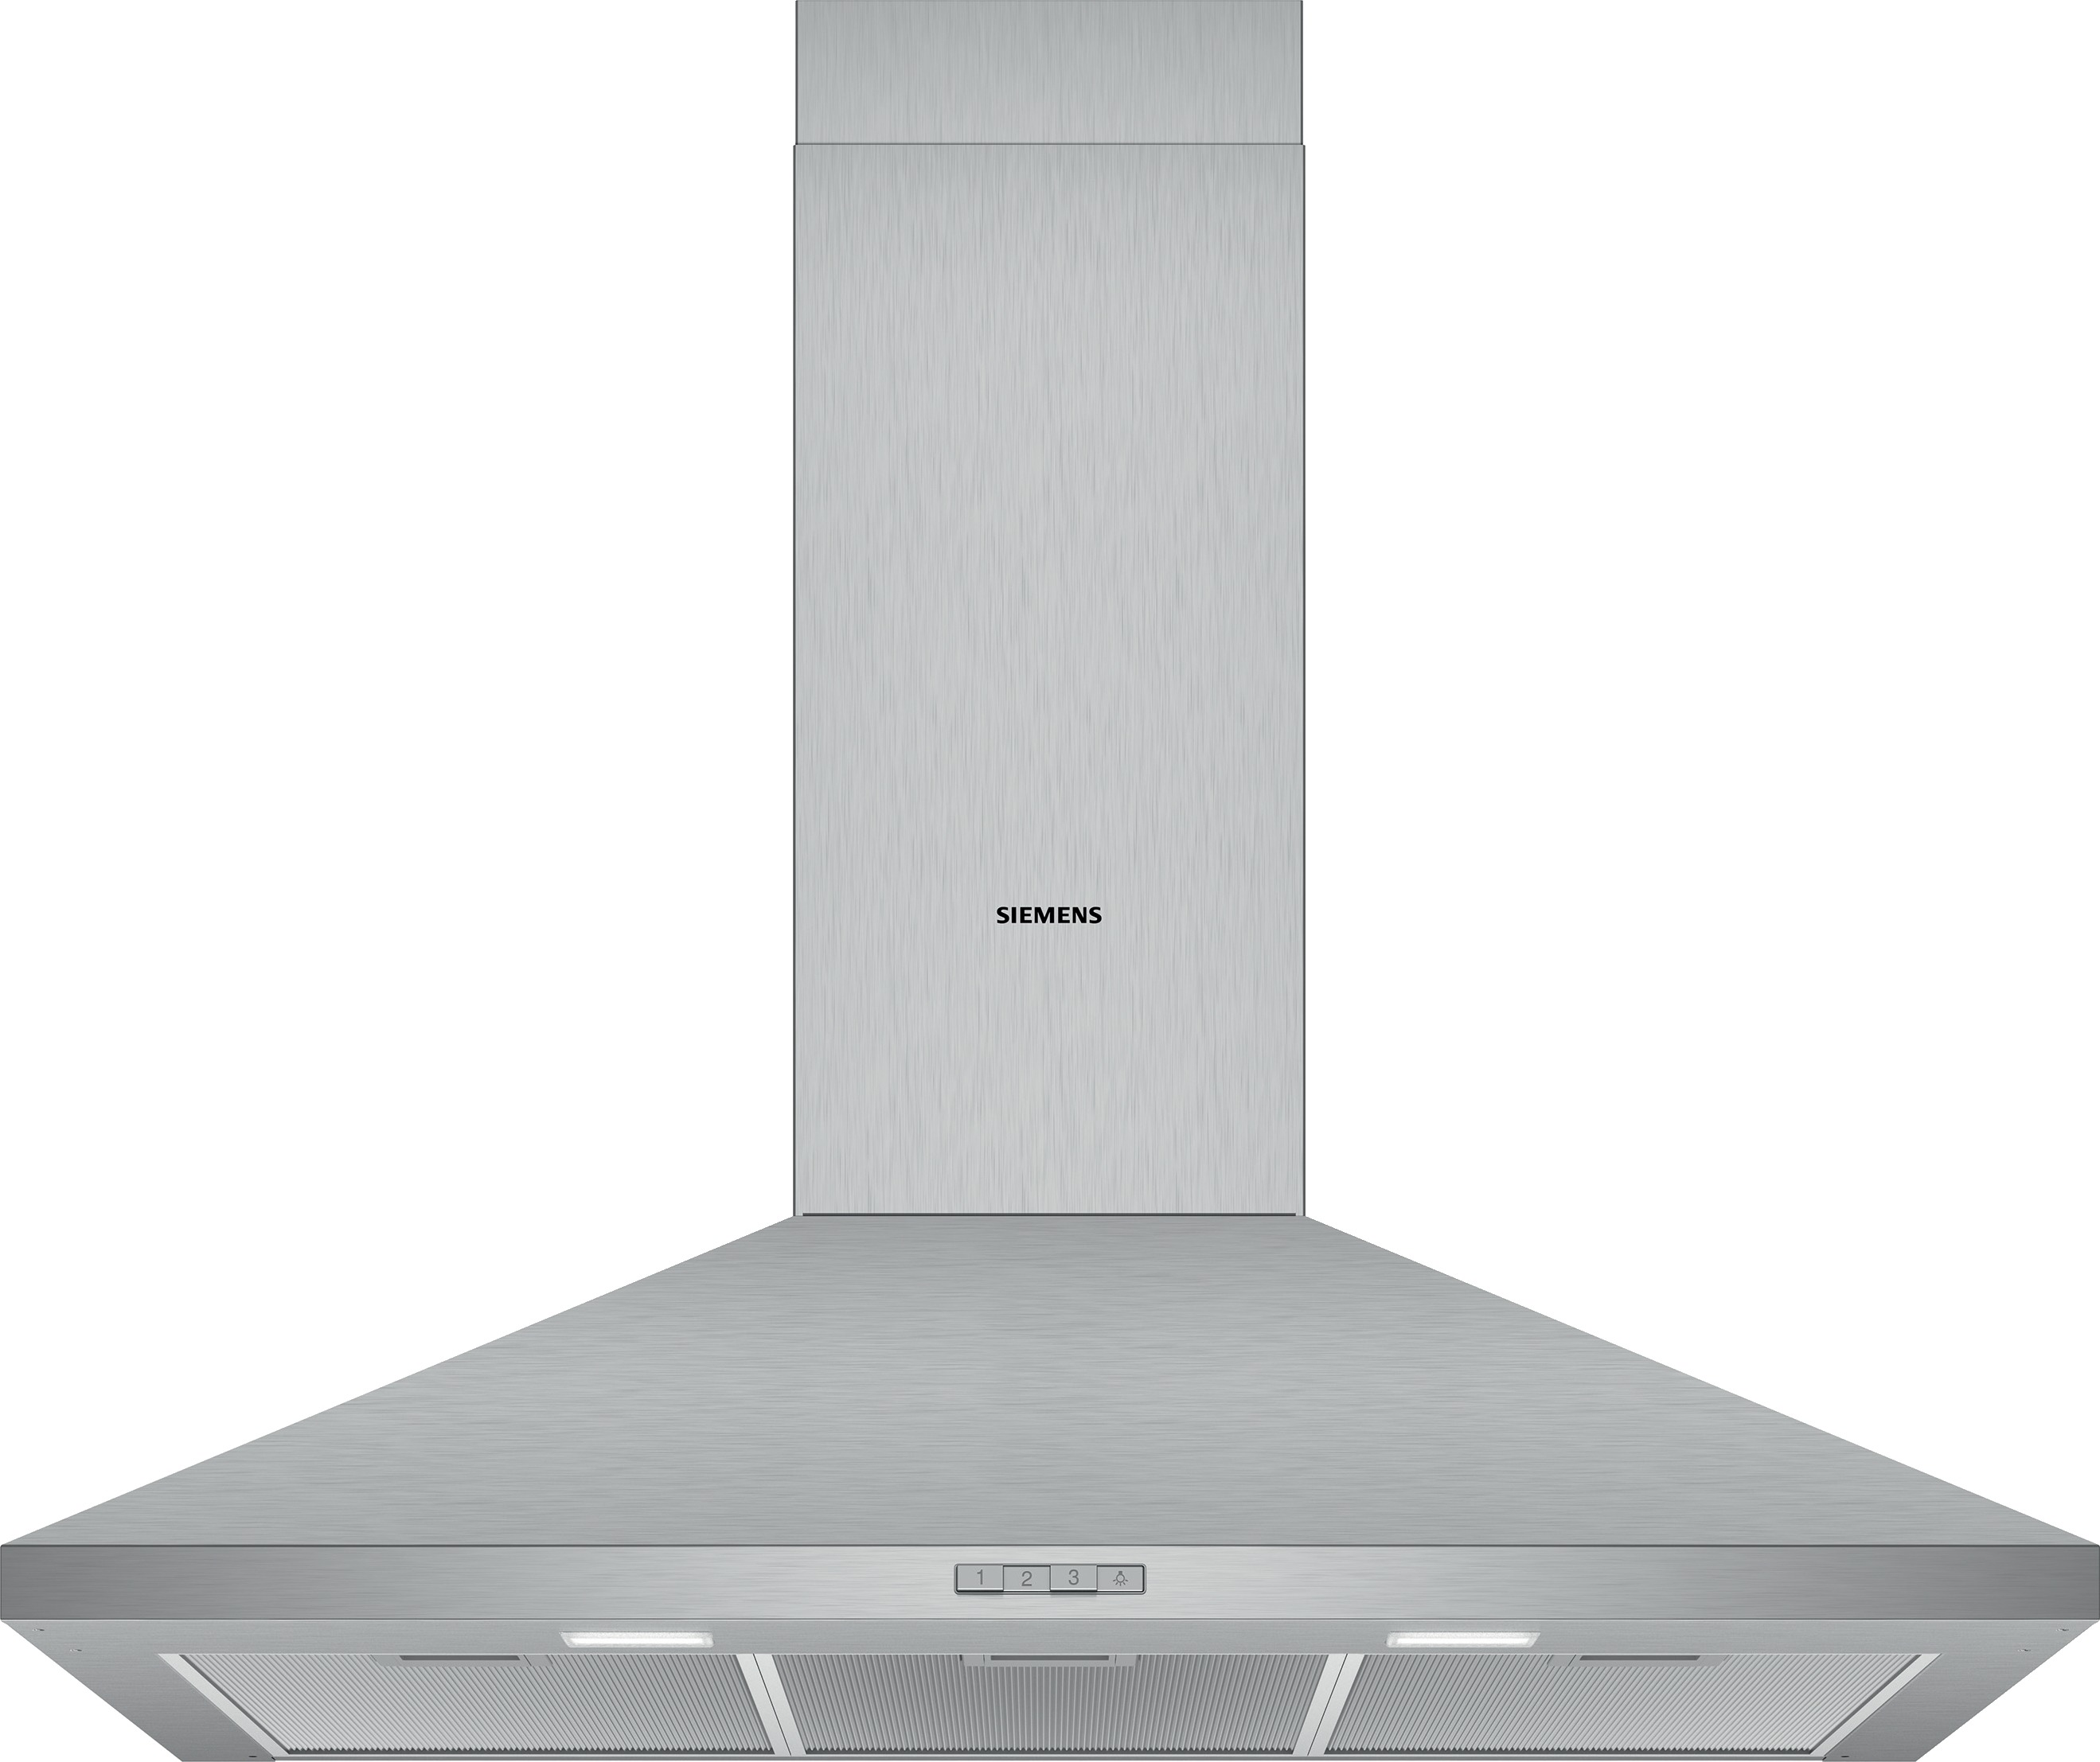 Siemens LC96PBC50 Schouwkap